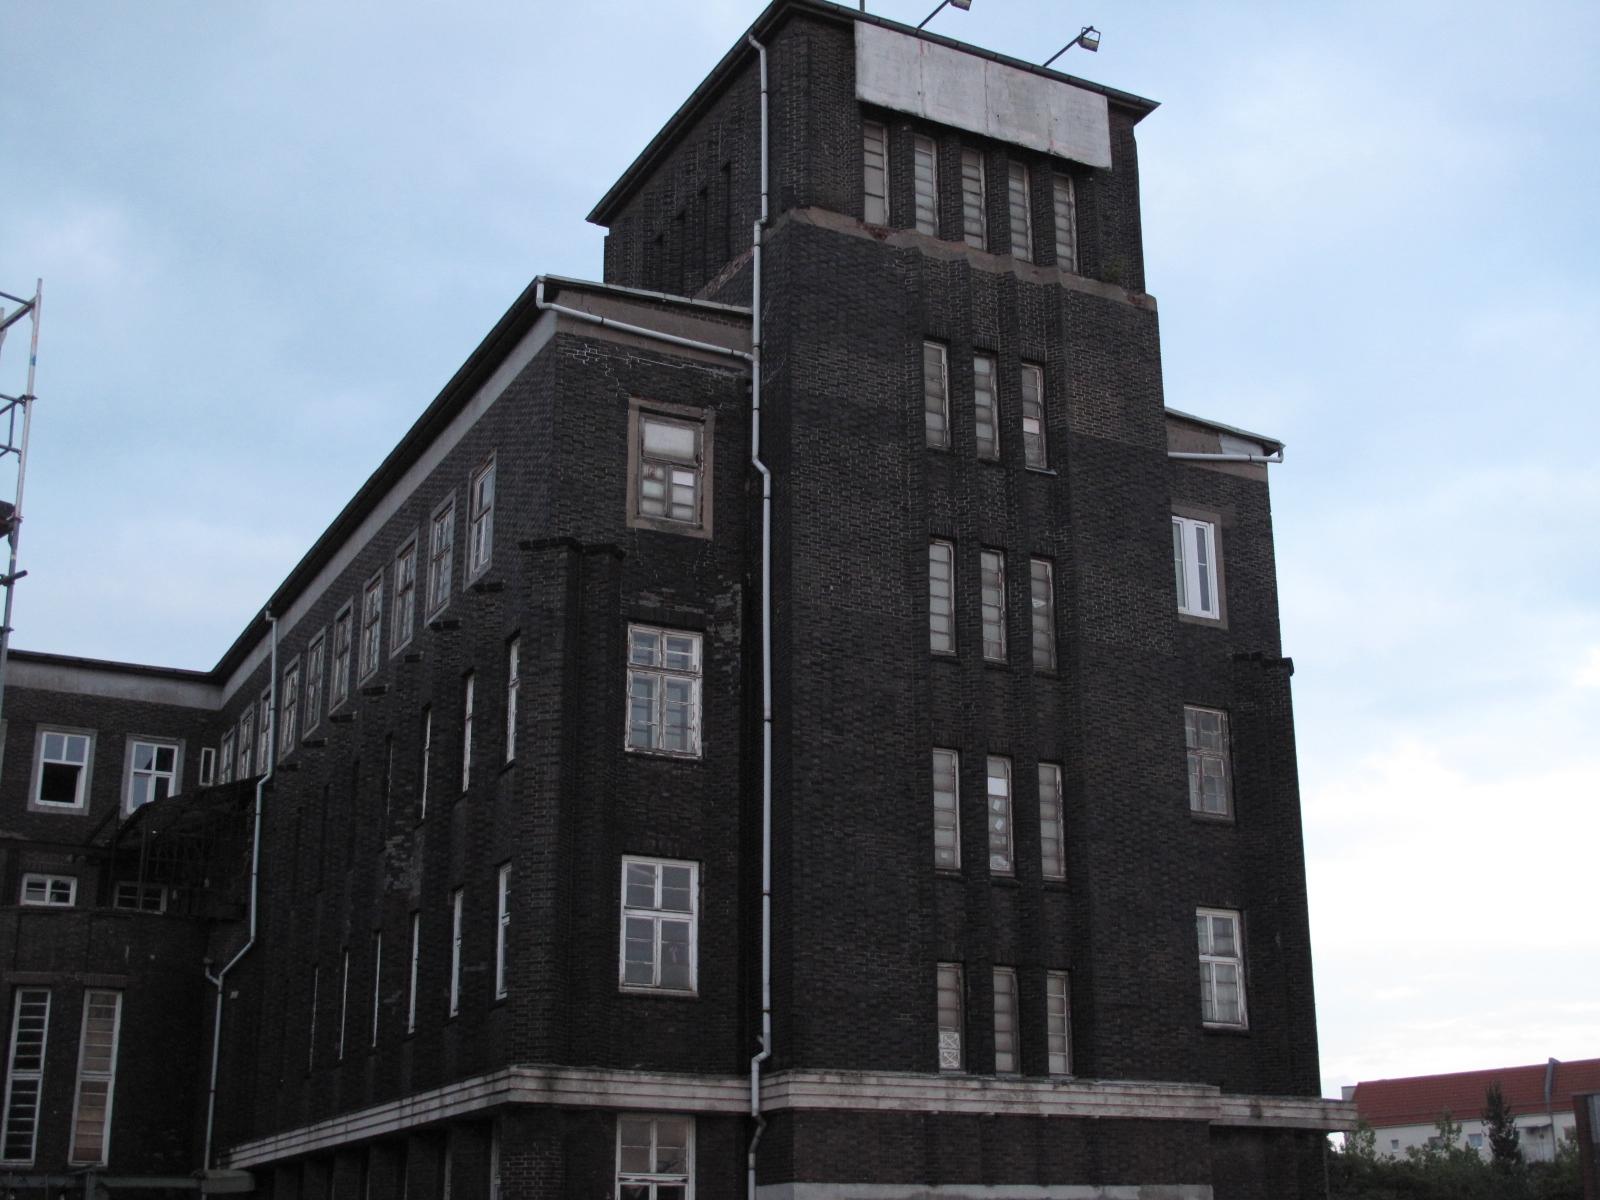 Brandshof Rothenburgsort